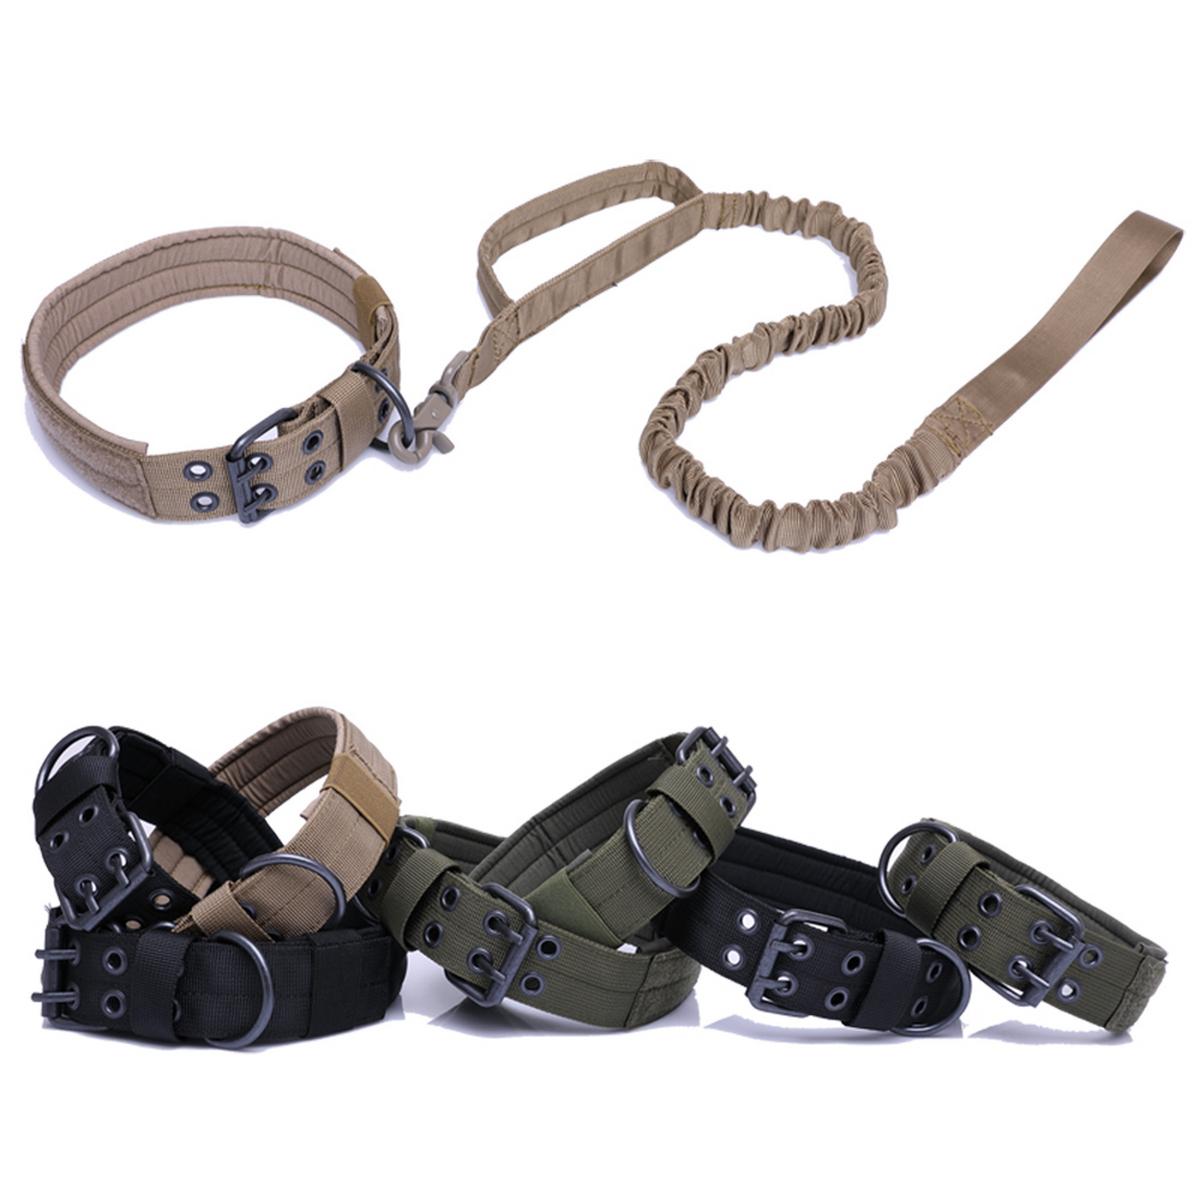 Tactical-Scorpion-Gear-Dog-Collar-Canine-K9-Training-Walking-Military-Nylon thumbnail 16